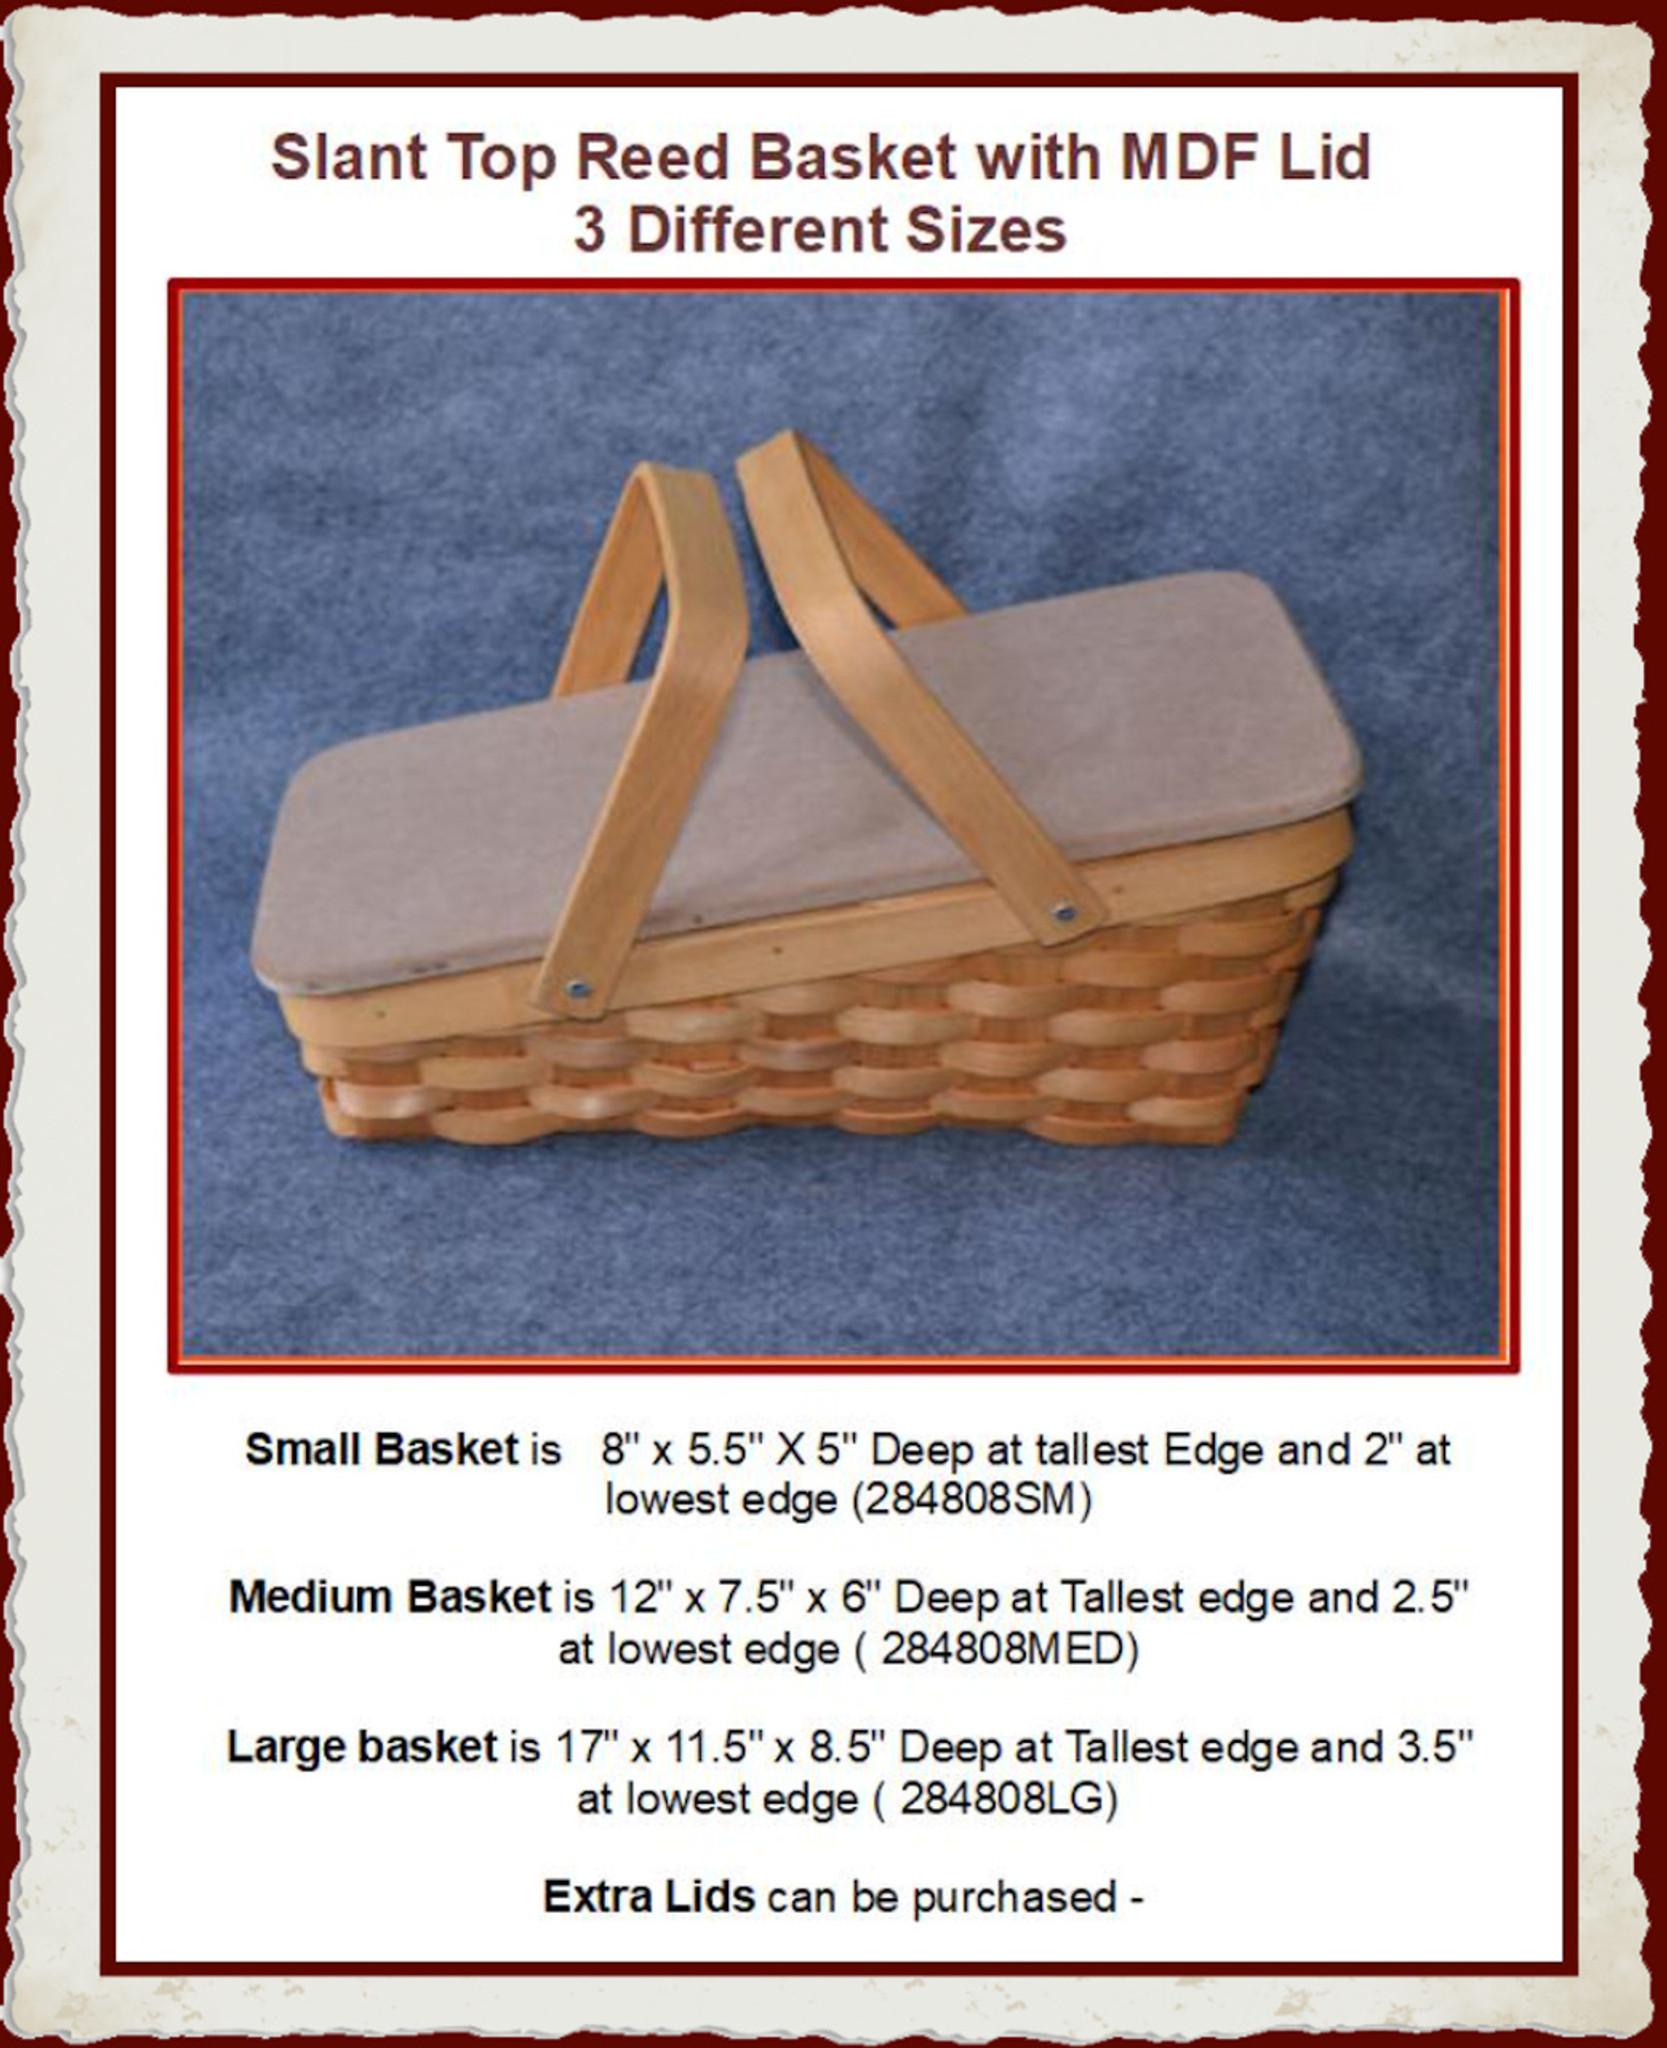 Basket - Slant Top Reed basket with MDF Lid - 2 Sizes (284808SM, 284808MED,  Large Size is Discontinued